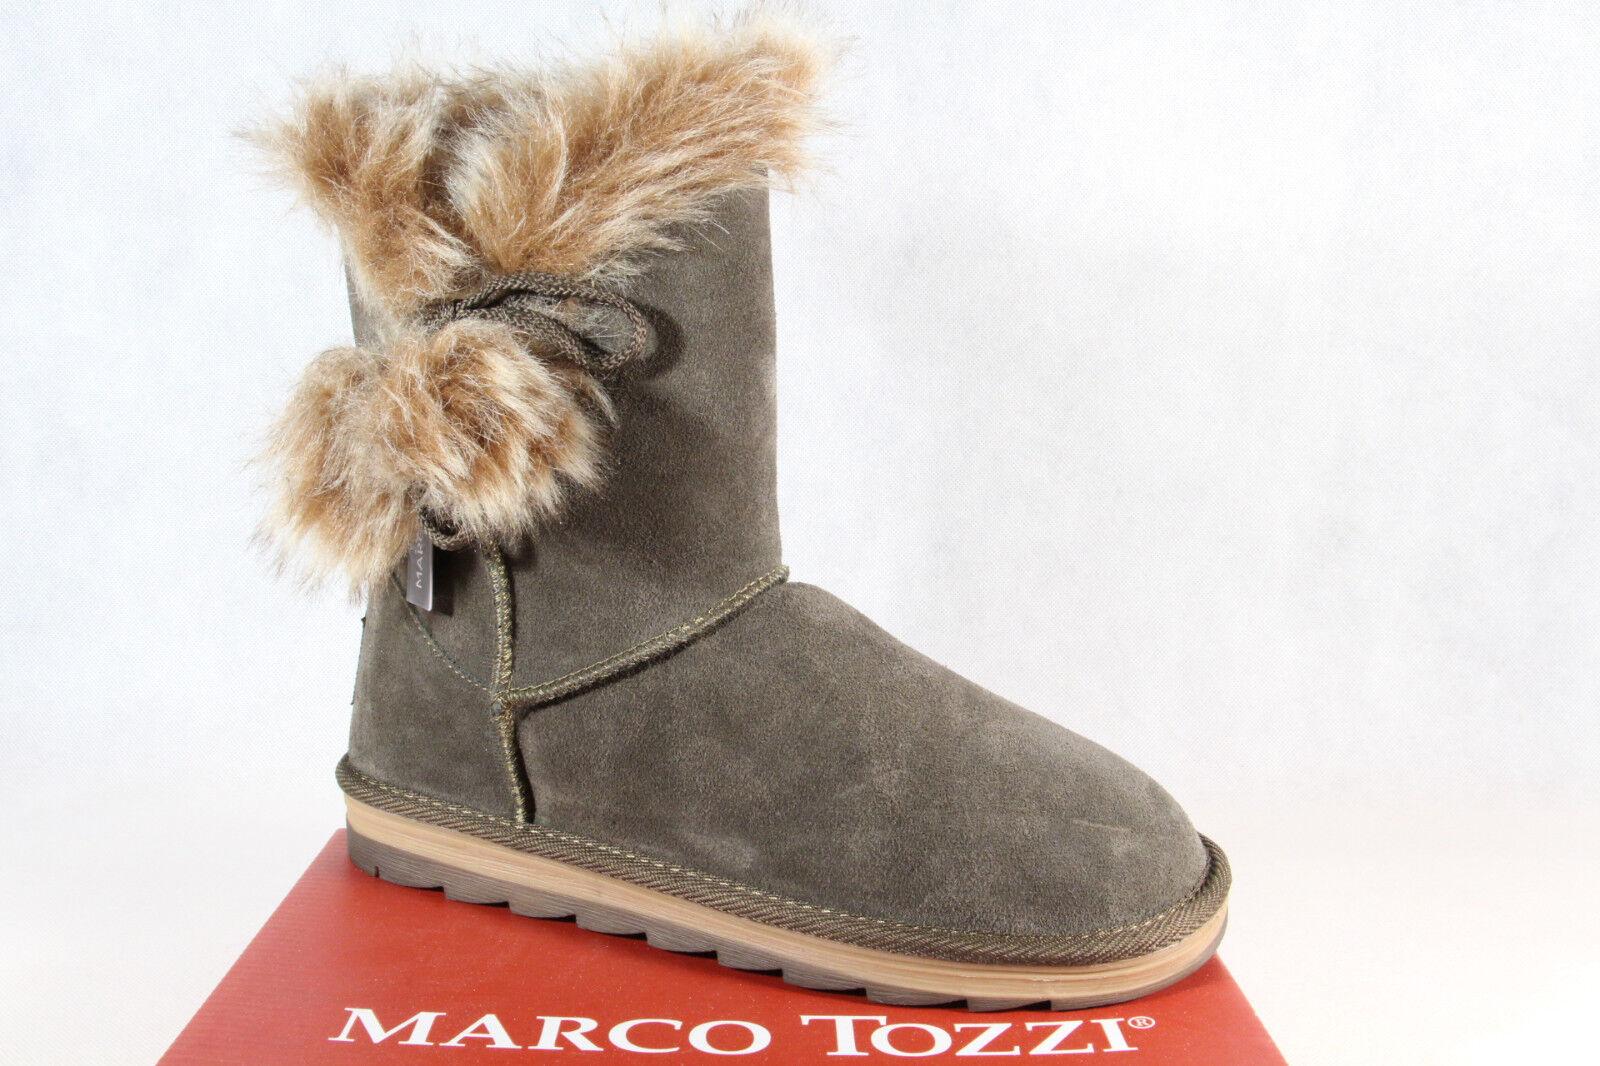 Marco Tozzi Botines Botines Botines botas Invierno Oliva 26824 Nuevo e3dd43